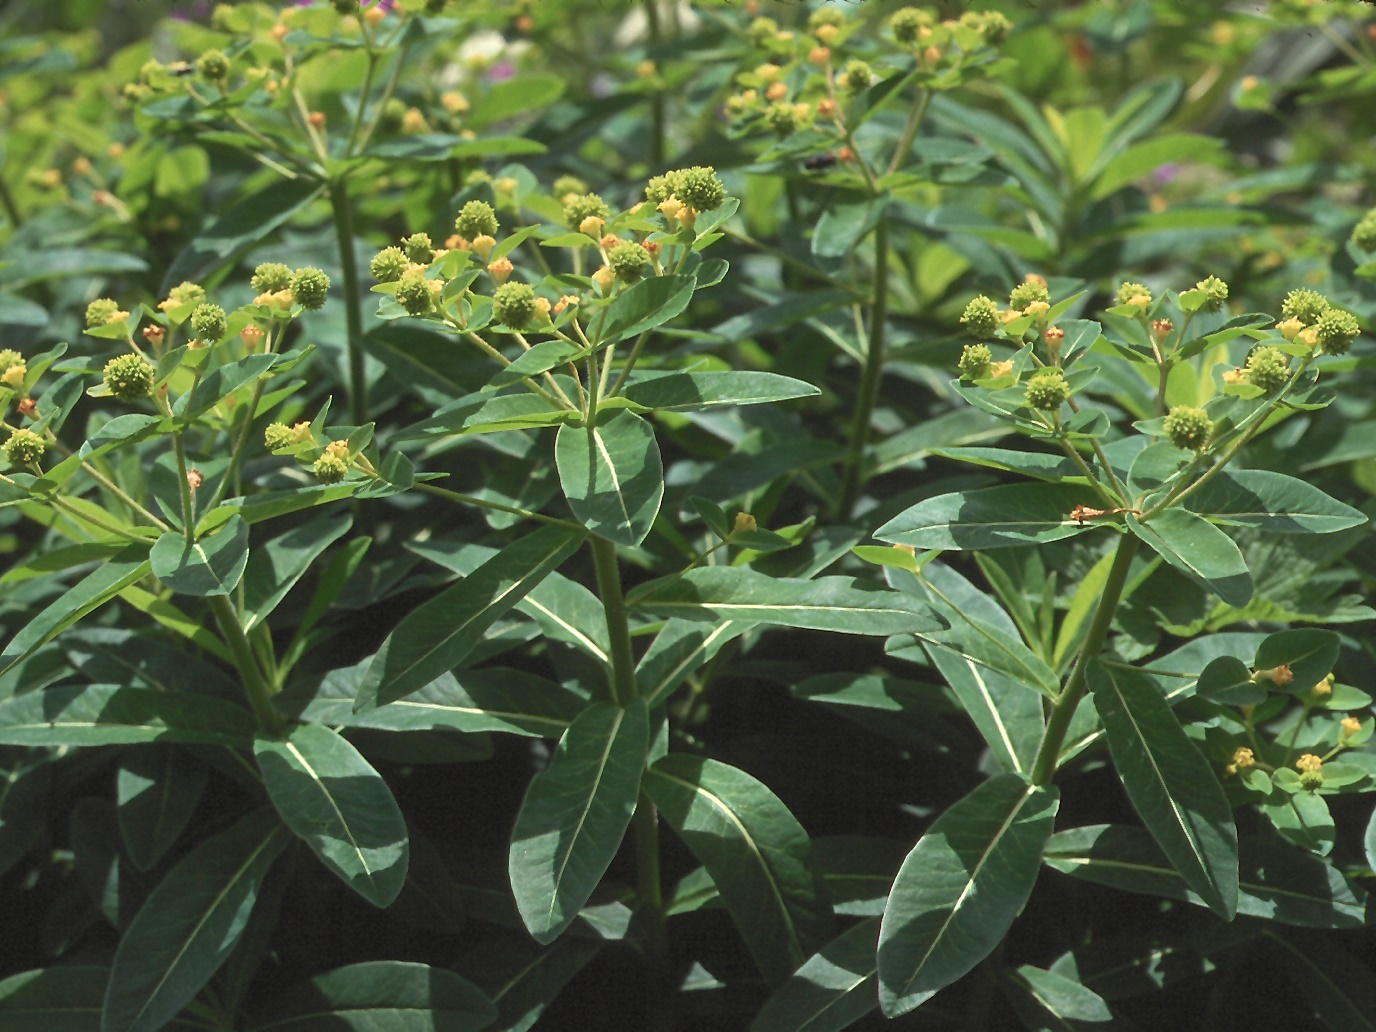 Euphorbia hibernica